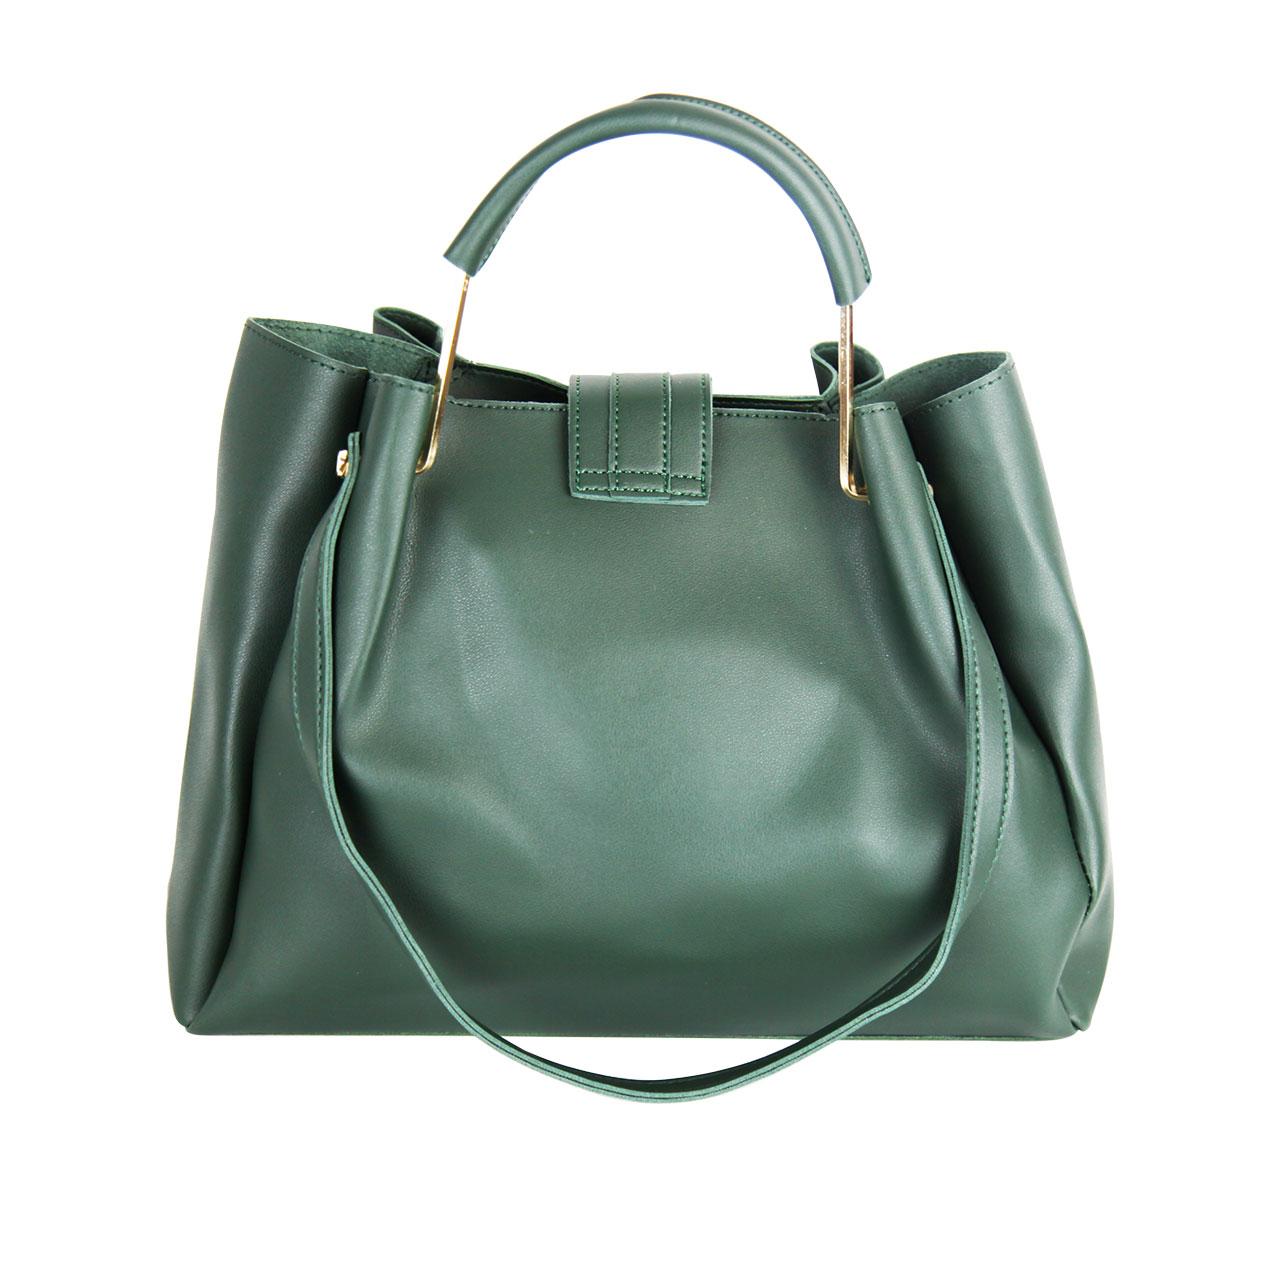 PU Crocodile Teal Blue/Green Handbag Bag Set For Women